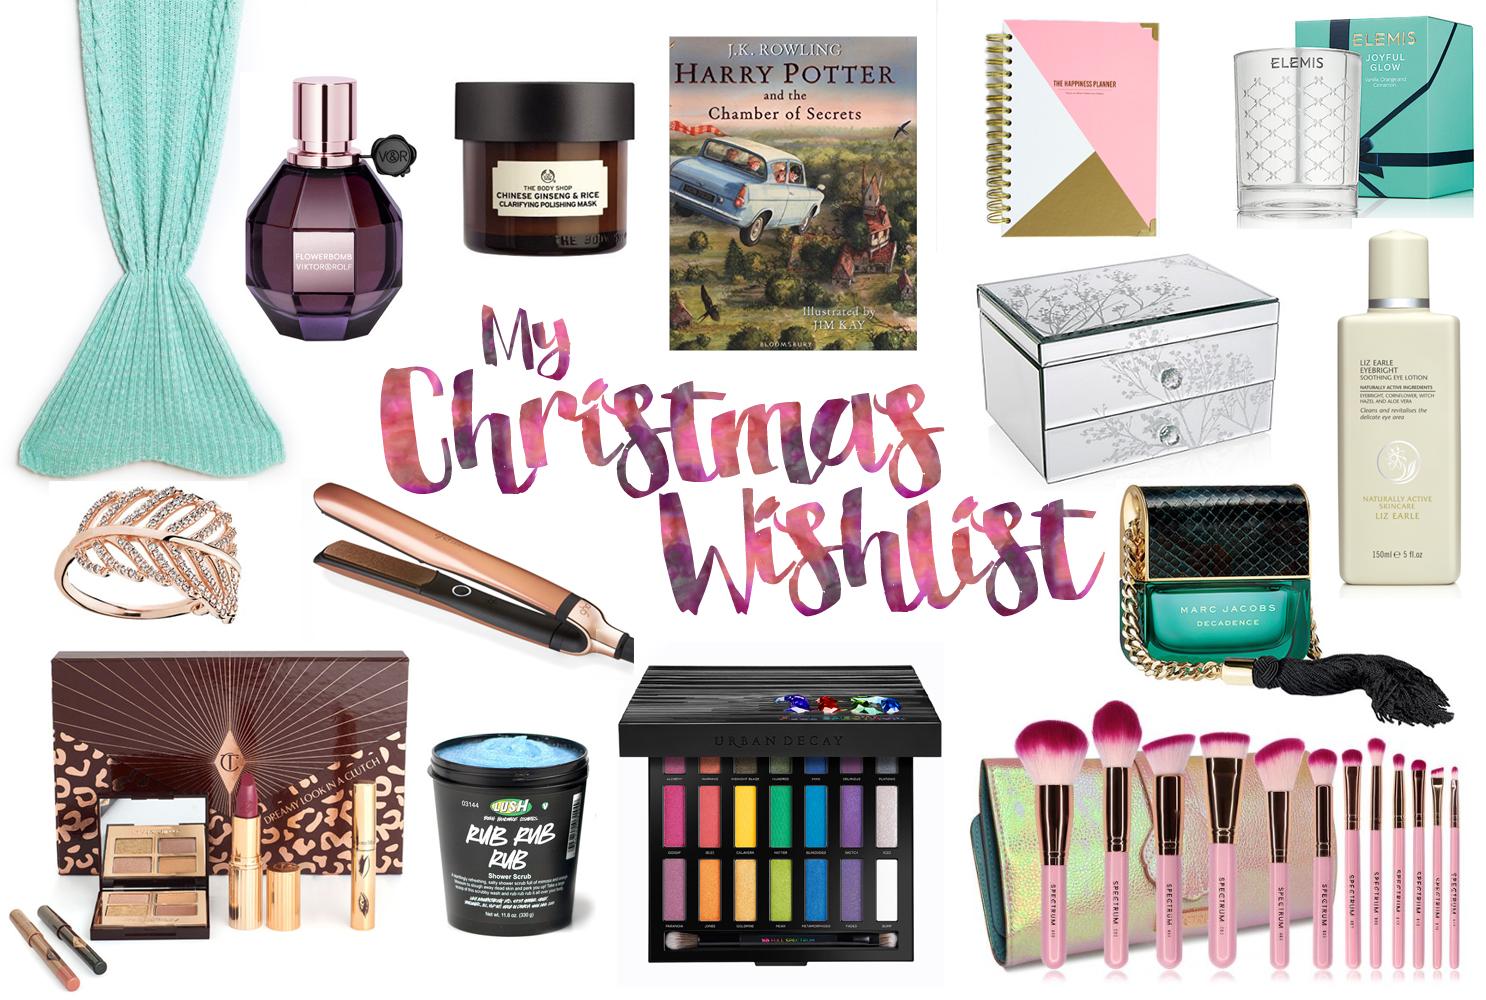 Christmas Wish List 2020 Christmas Wish List 2020 Ideas | Gwtrsk.onlinenewyear.site